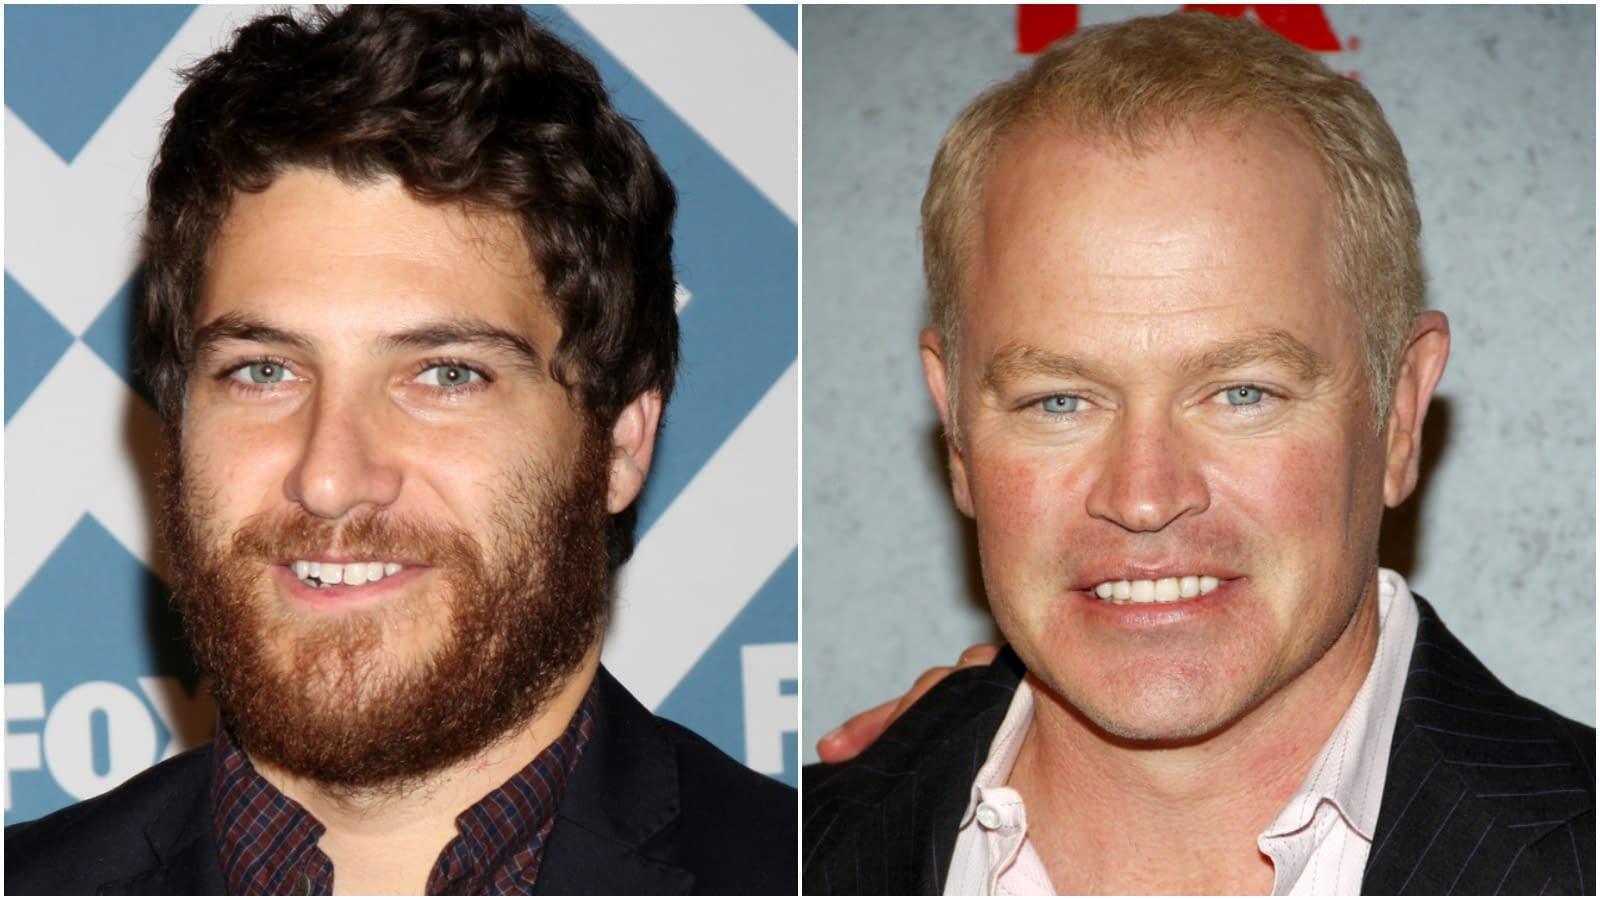 Adam Pally in 2014, Neal McDonough in 2012